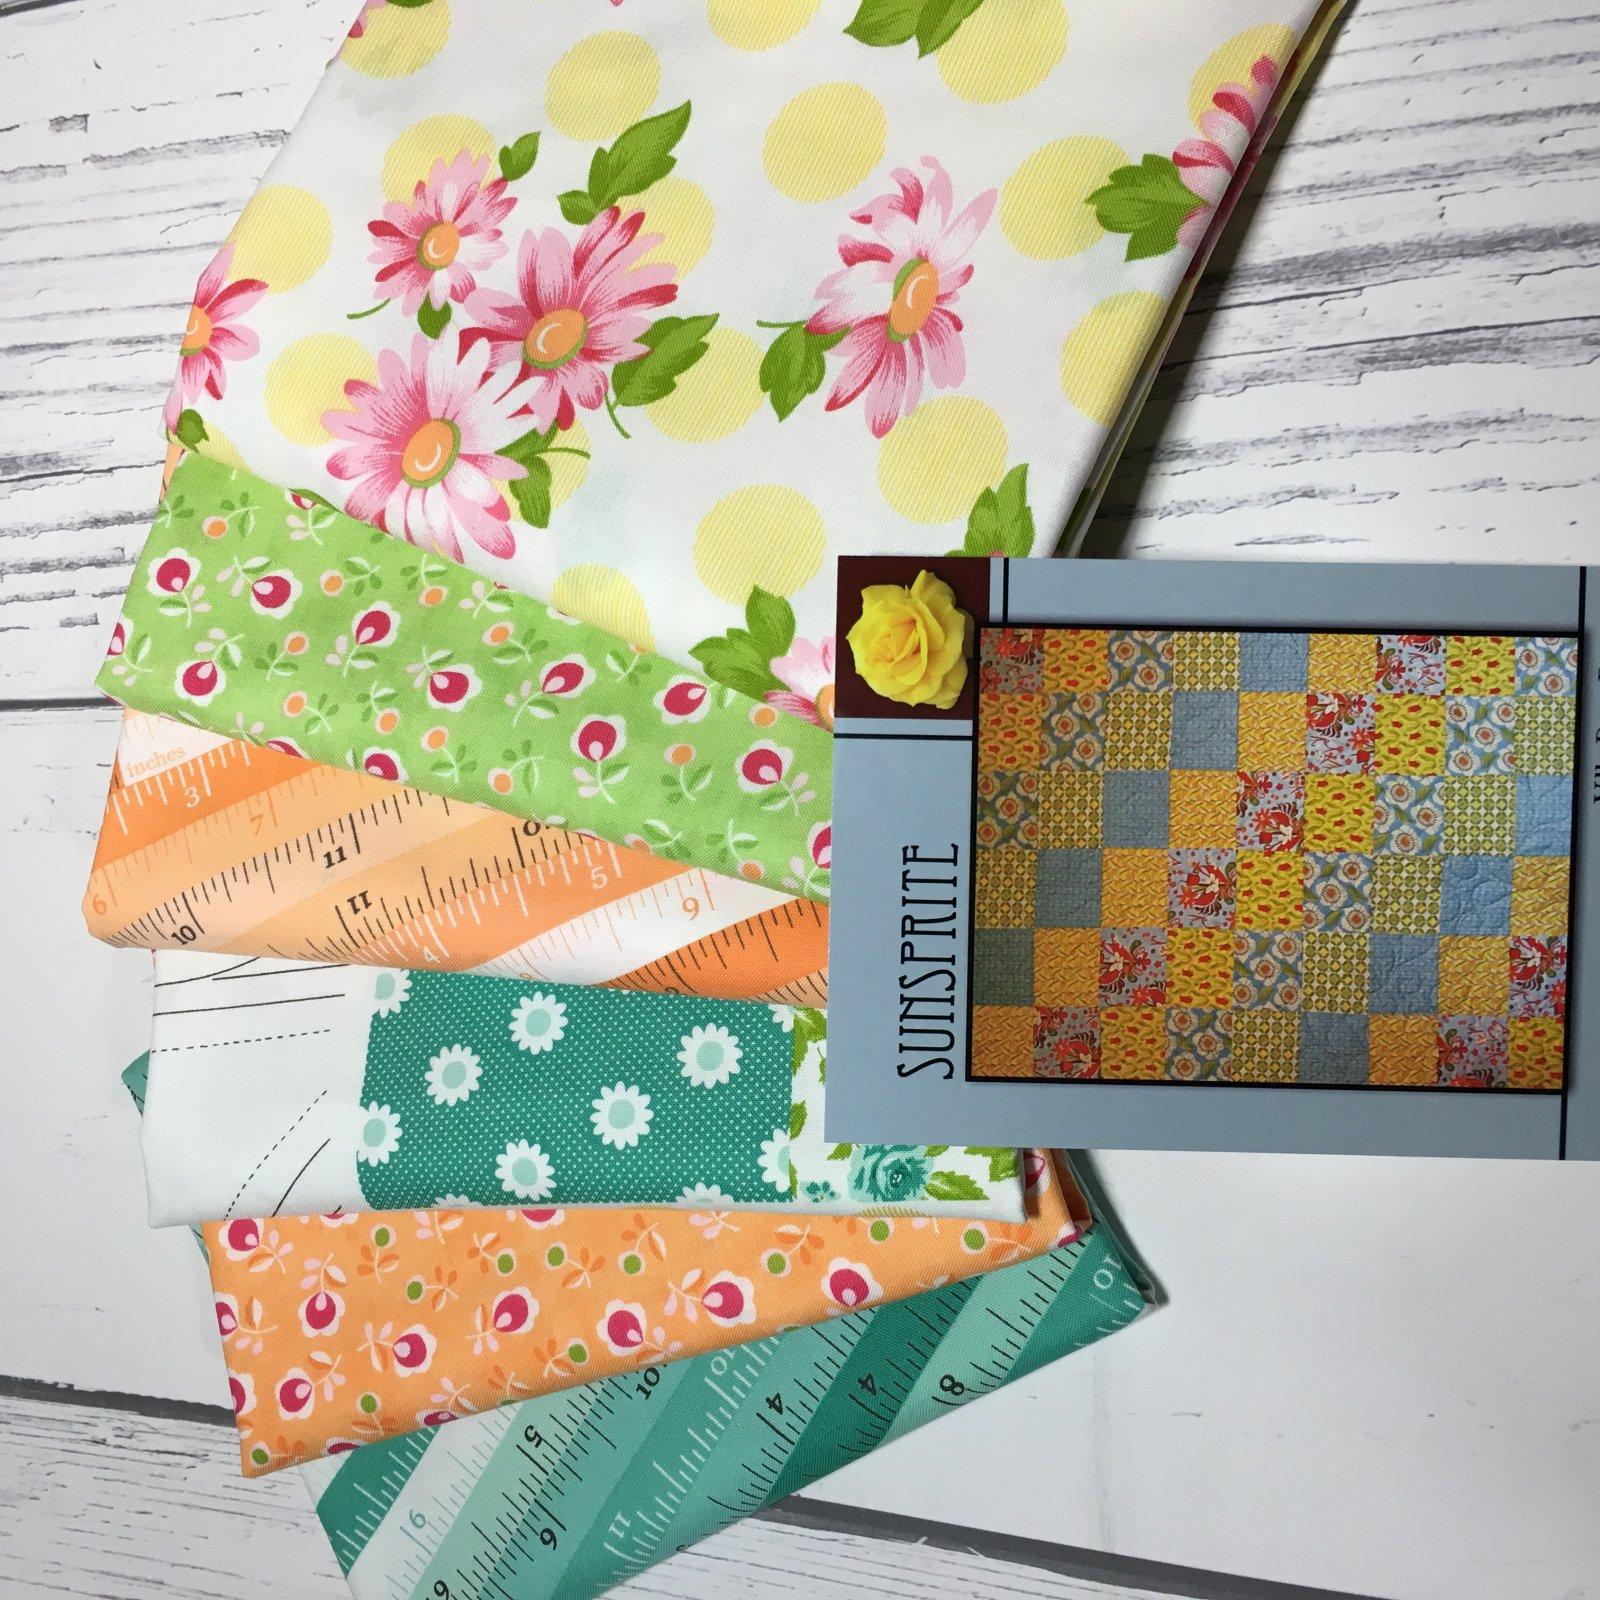 Sew Stitchy Quilt Kit